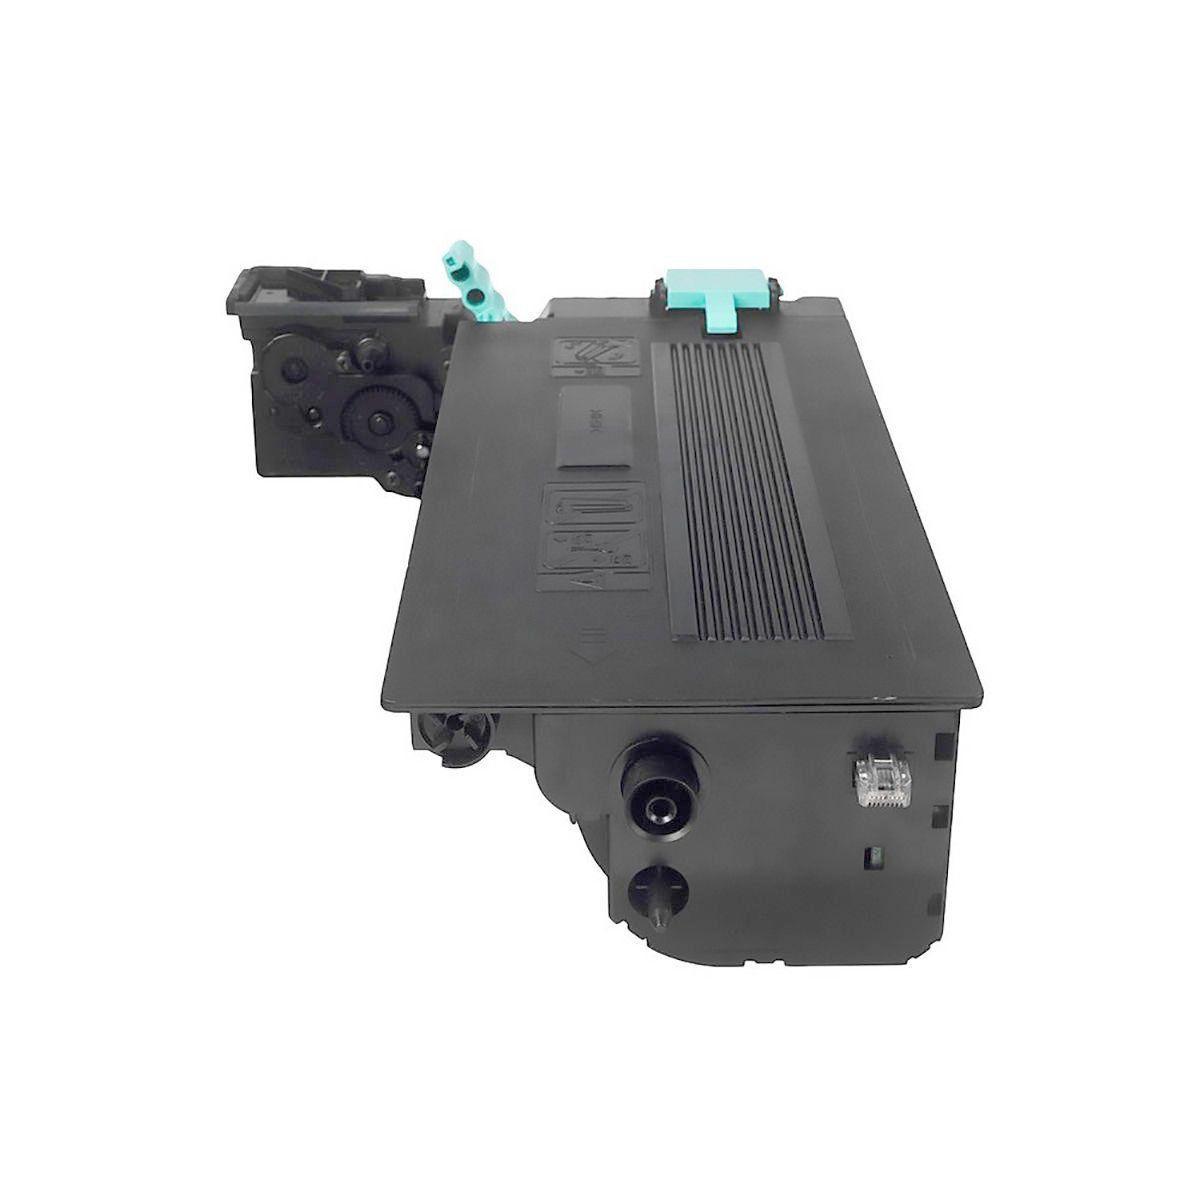 Compatível: Toner D6555 6555A para Samsung SCX-6555 SCX-6555n SCX-6555nx SCX-6545 SCX-6545n SCX6555 / Preto / 25.000